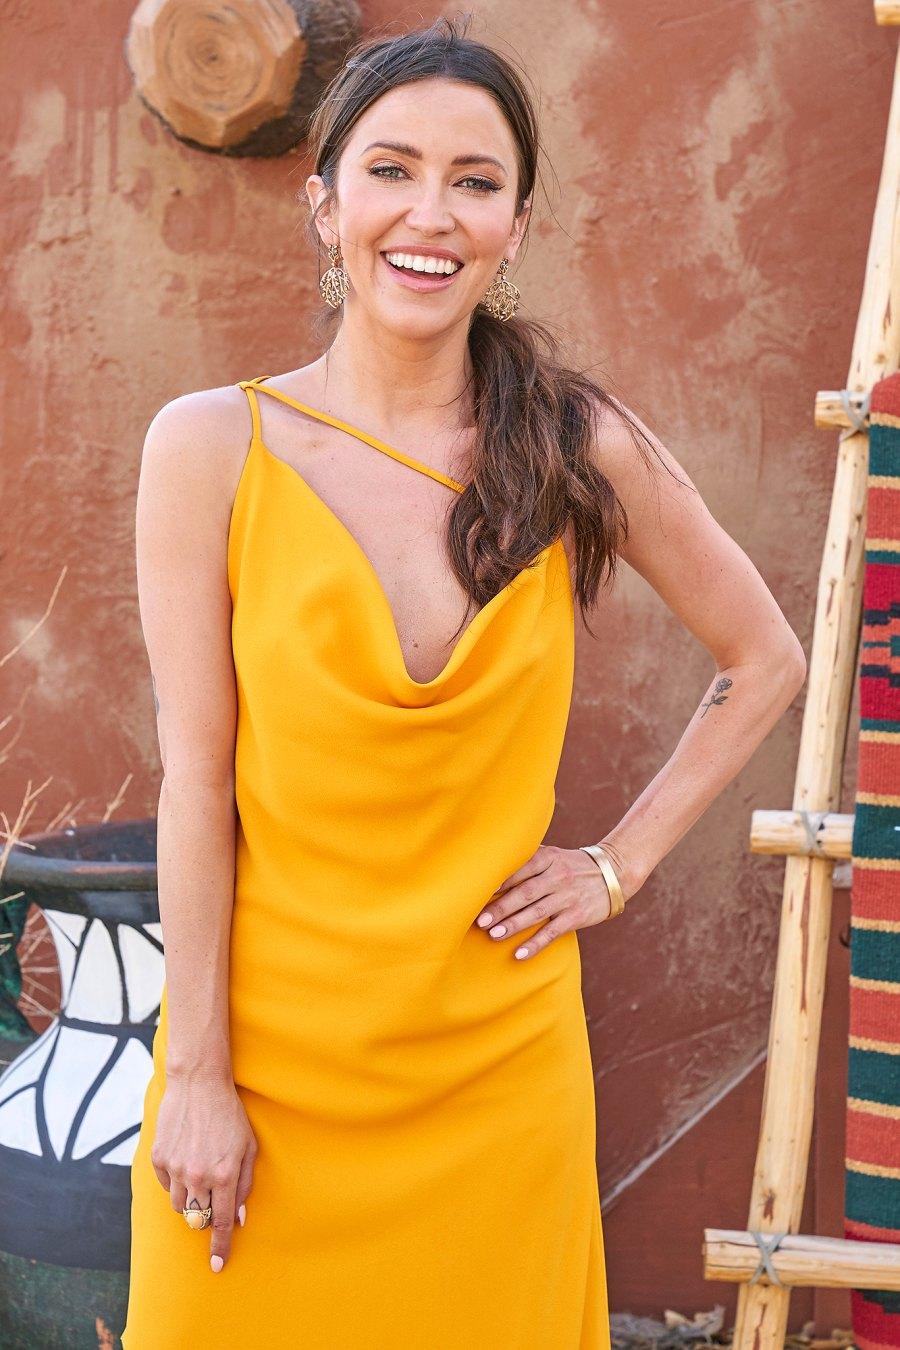 Kaitlyn Bristowe Bachelor Nation Reacts Katie Thurston and Blake Moynes Engagement Bachelorette